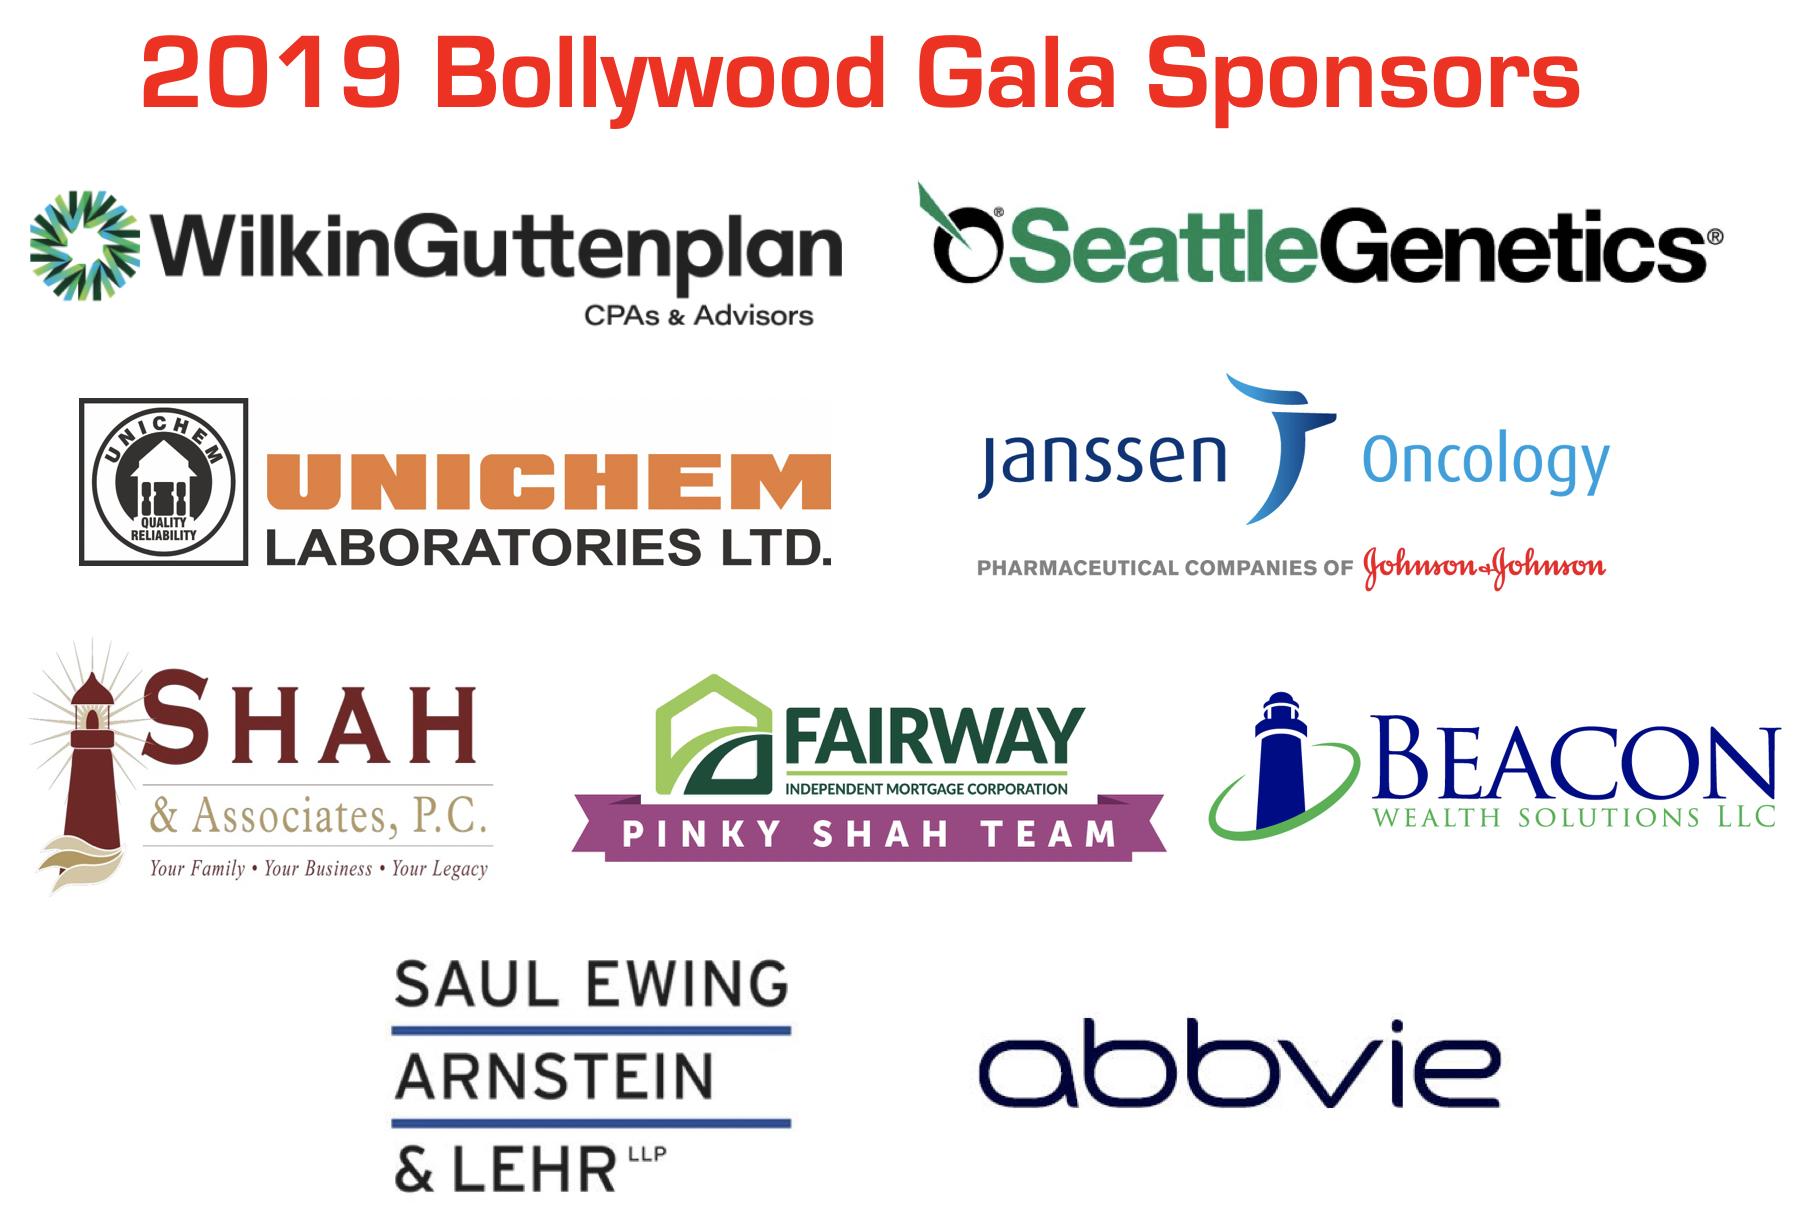 BG 2019 Sponsors.png